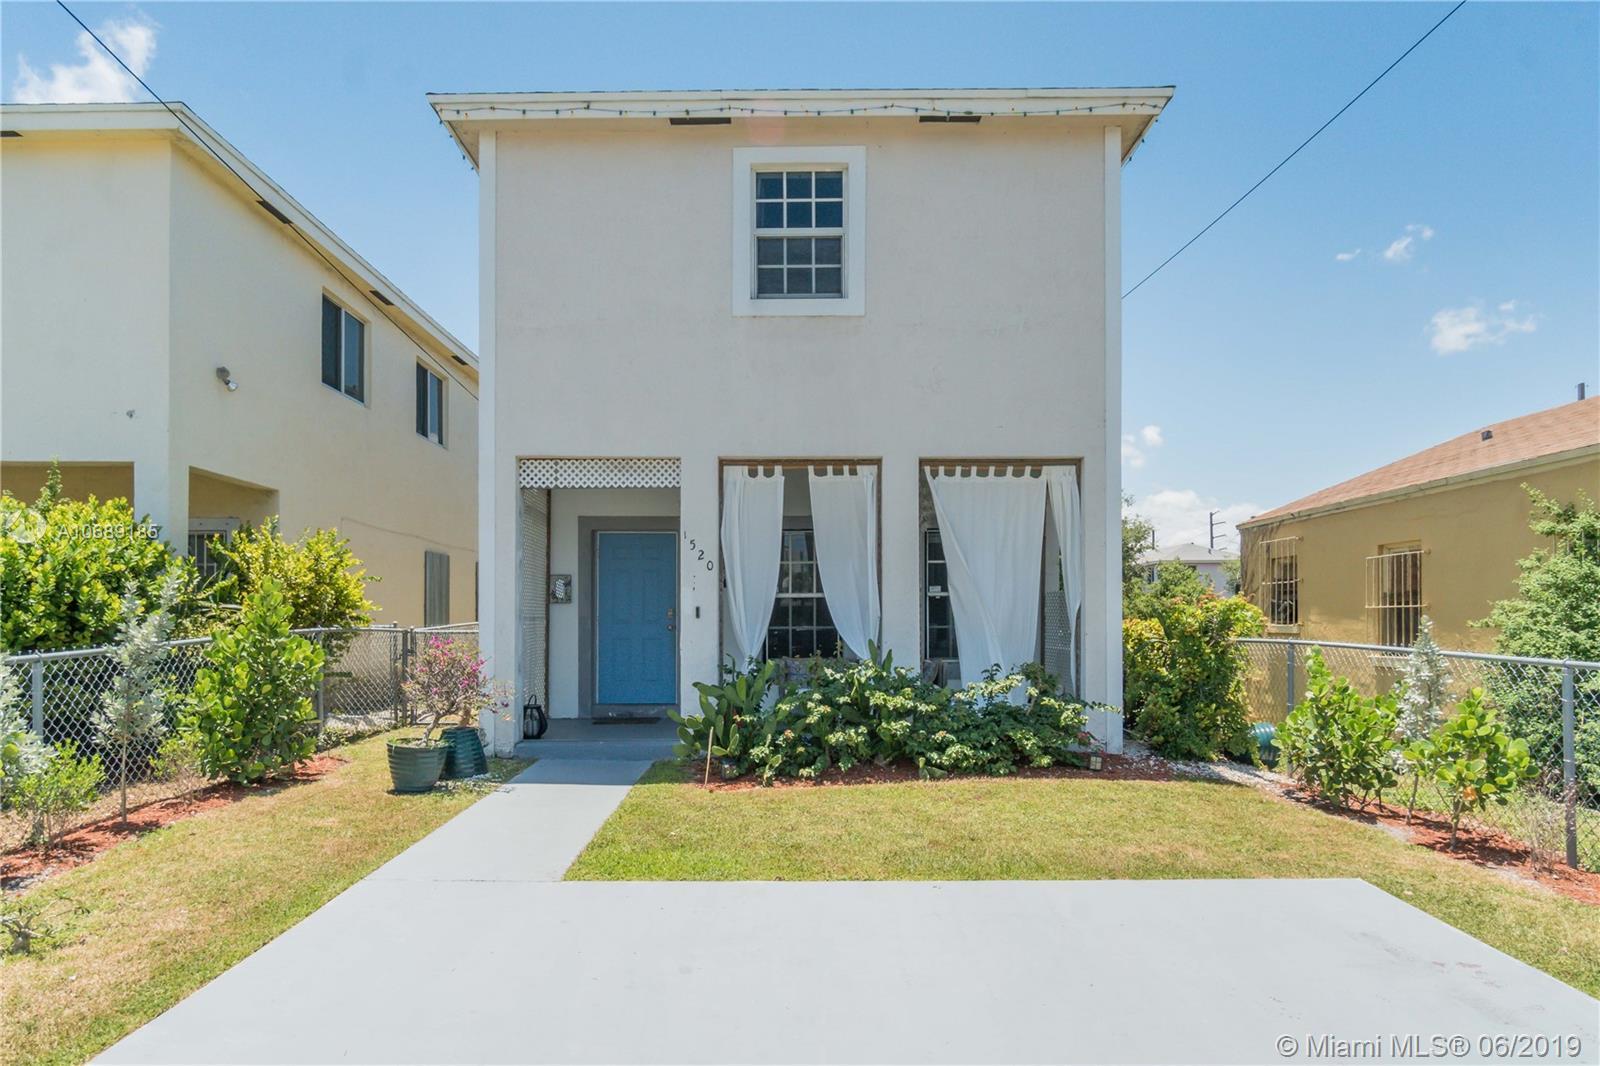 1520 NW 1st Ave, Grand Bahama Island, Florida